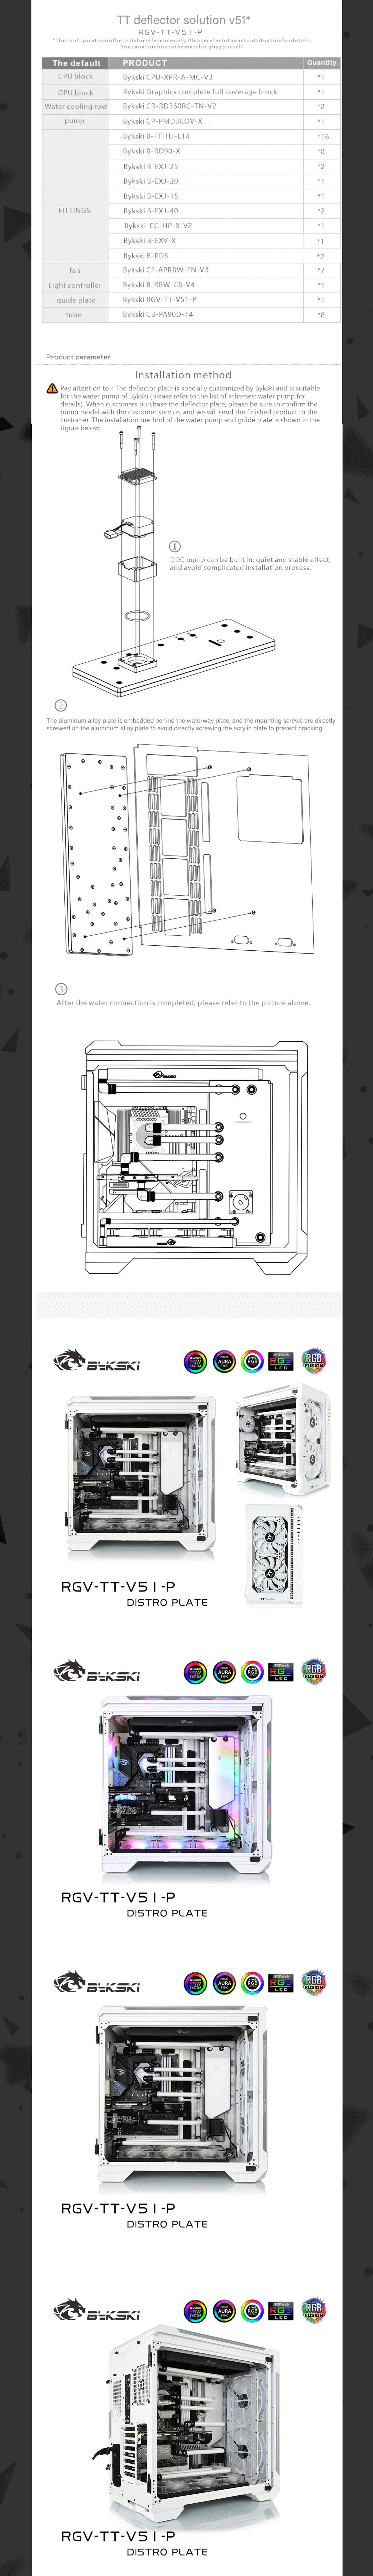 Bykski Waterway Board Kit RGV-TT-V51-P Distro Plate For TT View 51 Case Acrylic Tranperant For Thermaltake Water Cooling Loop